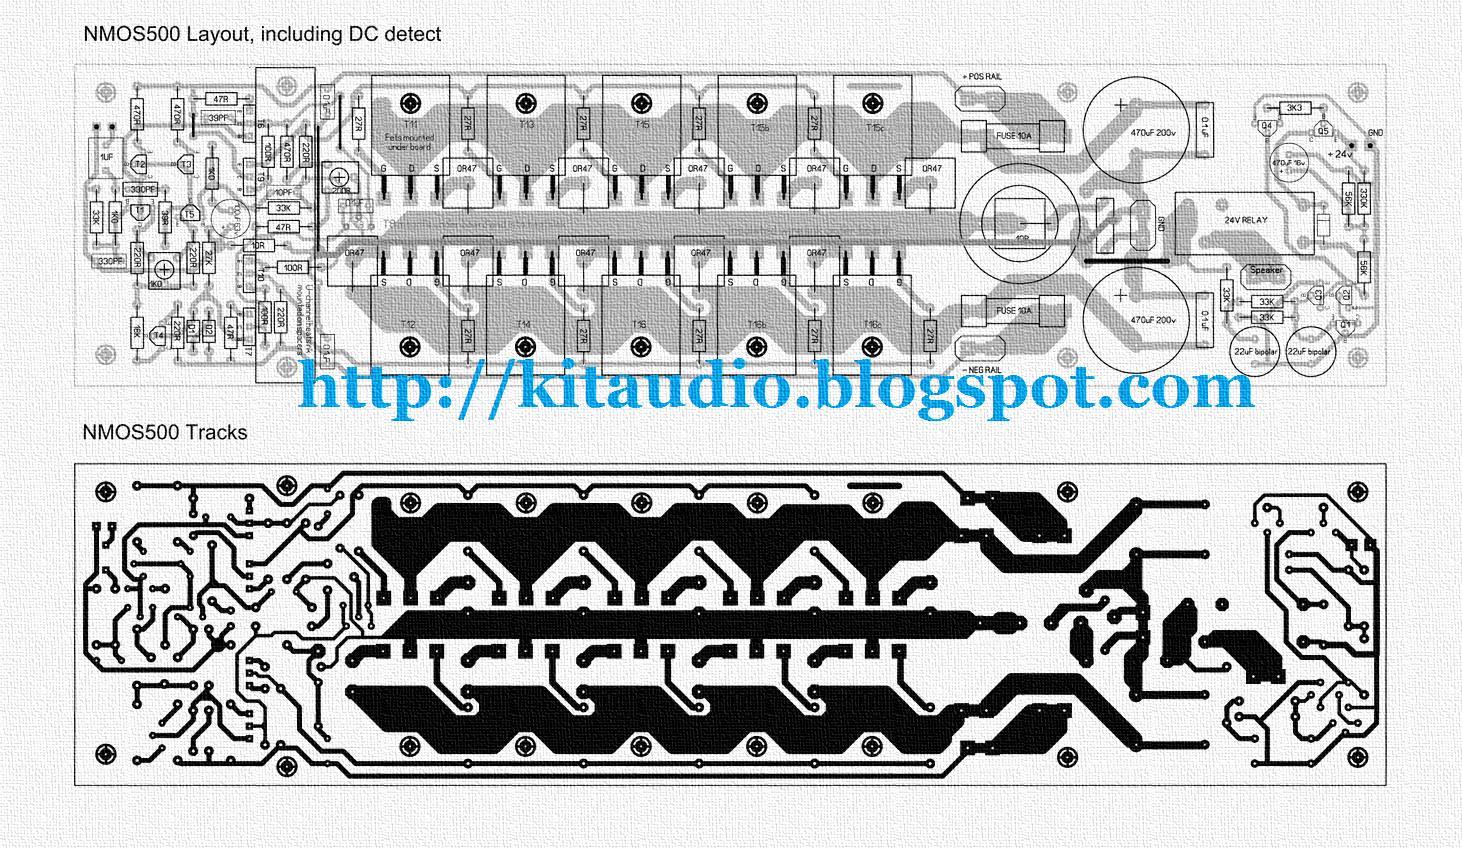 boss rt3 plow side wiring diagram audio kit: actrk 400 / 600 watt power amplifier with ... boss 600w 400 amp wiring diagram